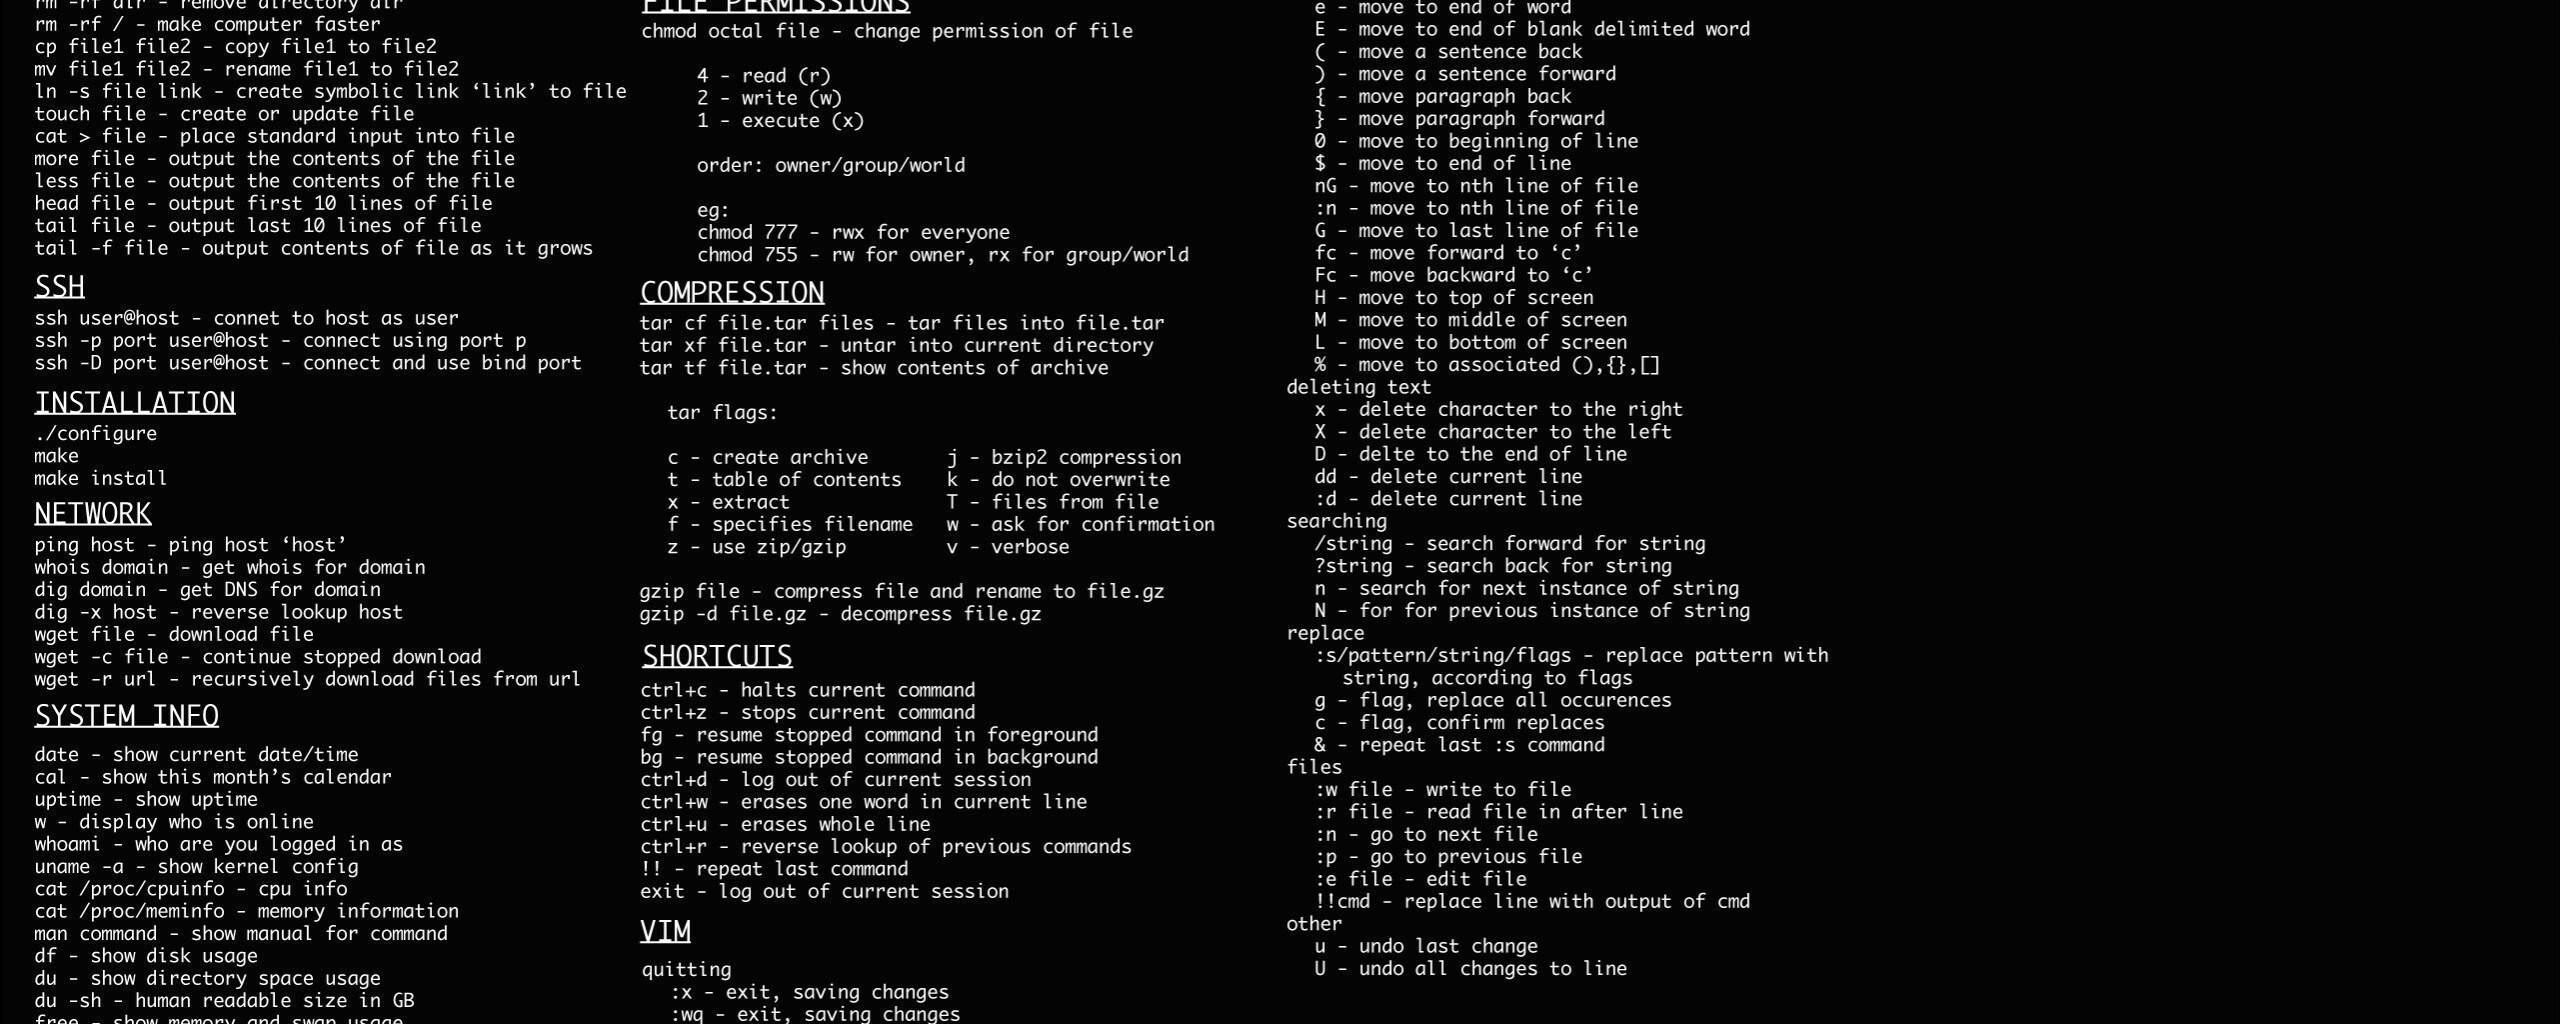 2560x1024 Linux Dark Command Line 2560x1024 Resolution HD 4k